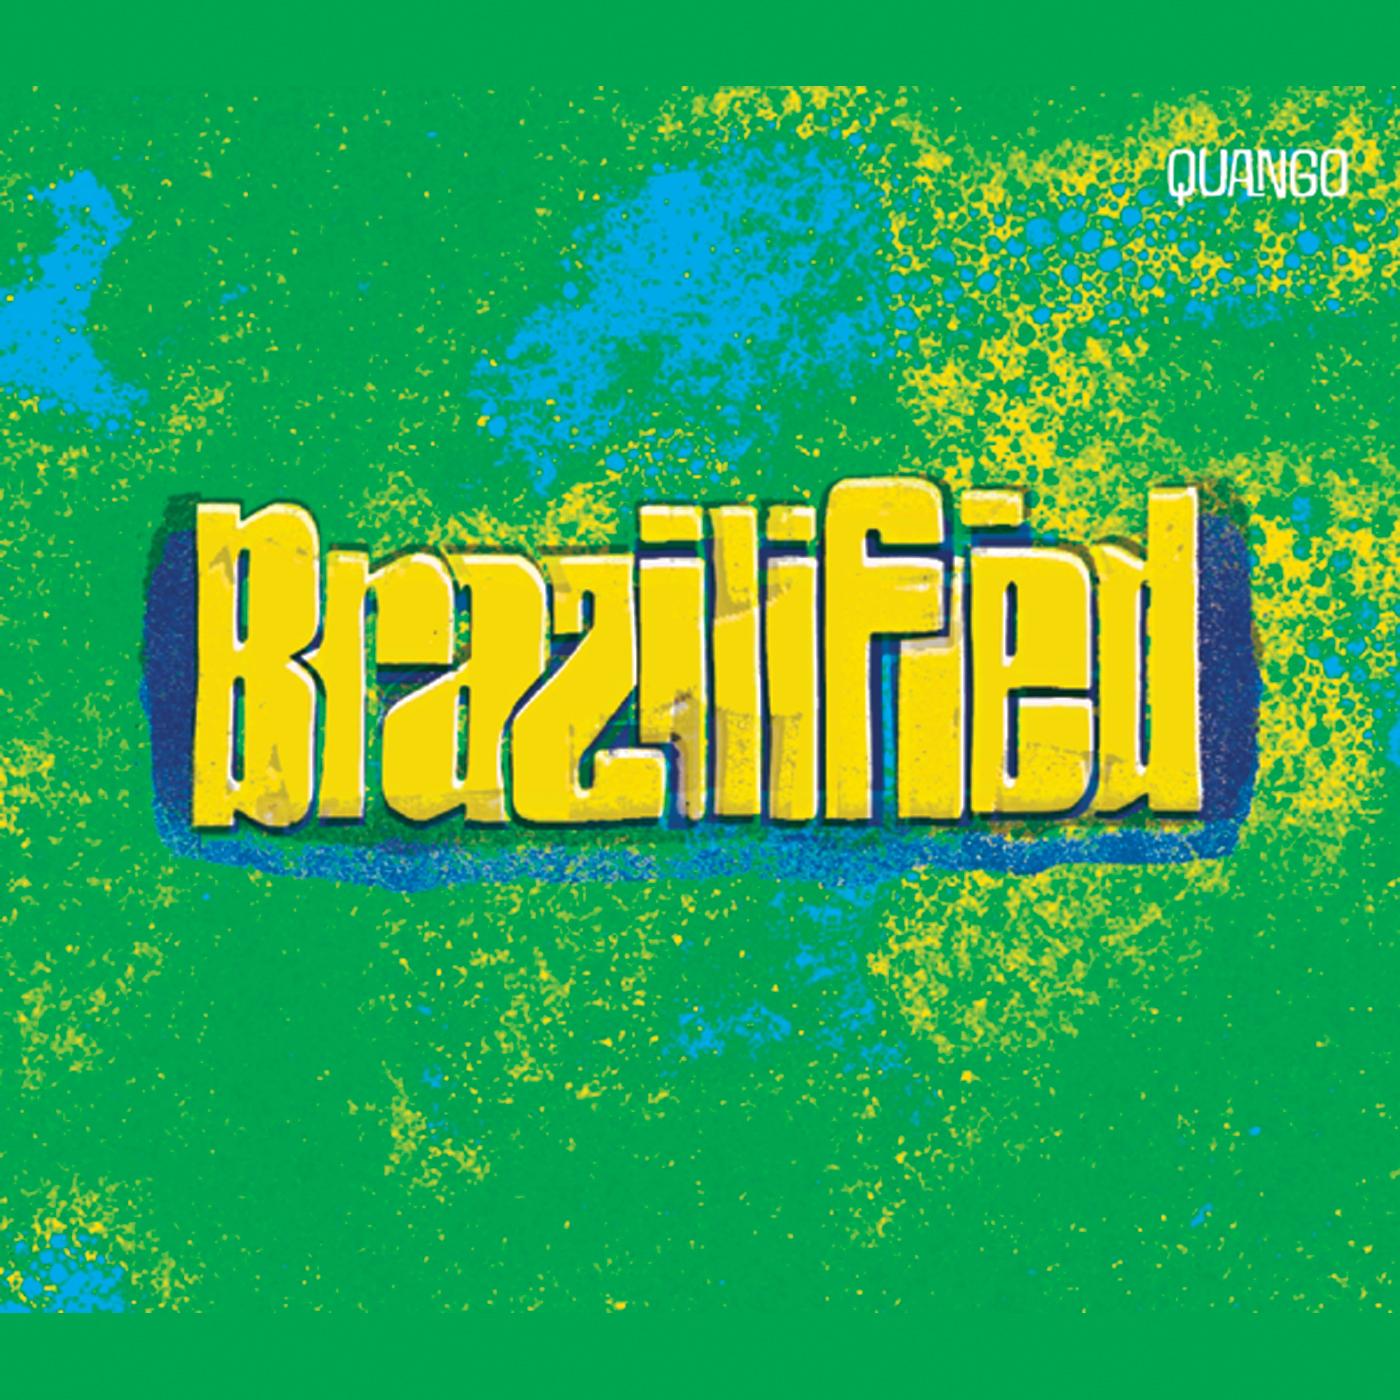 Brazilified.jpg